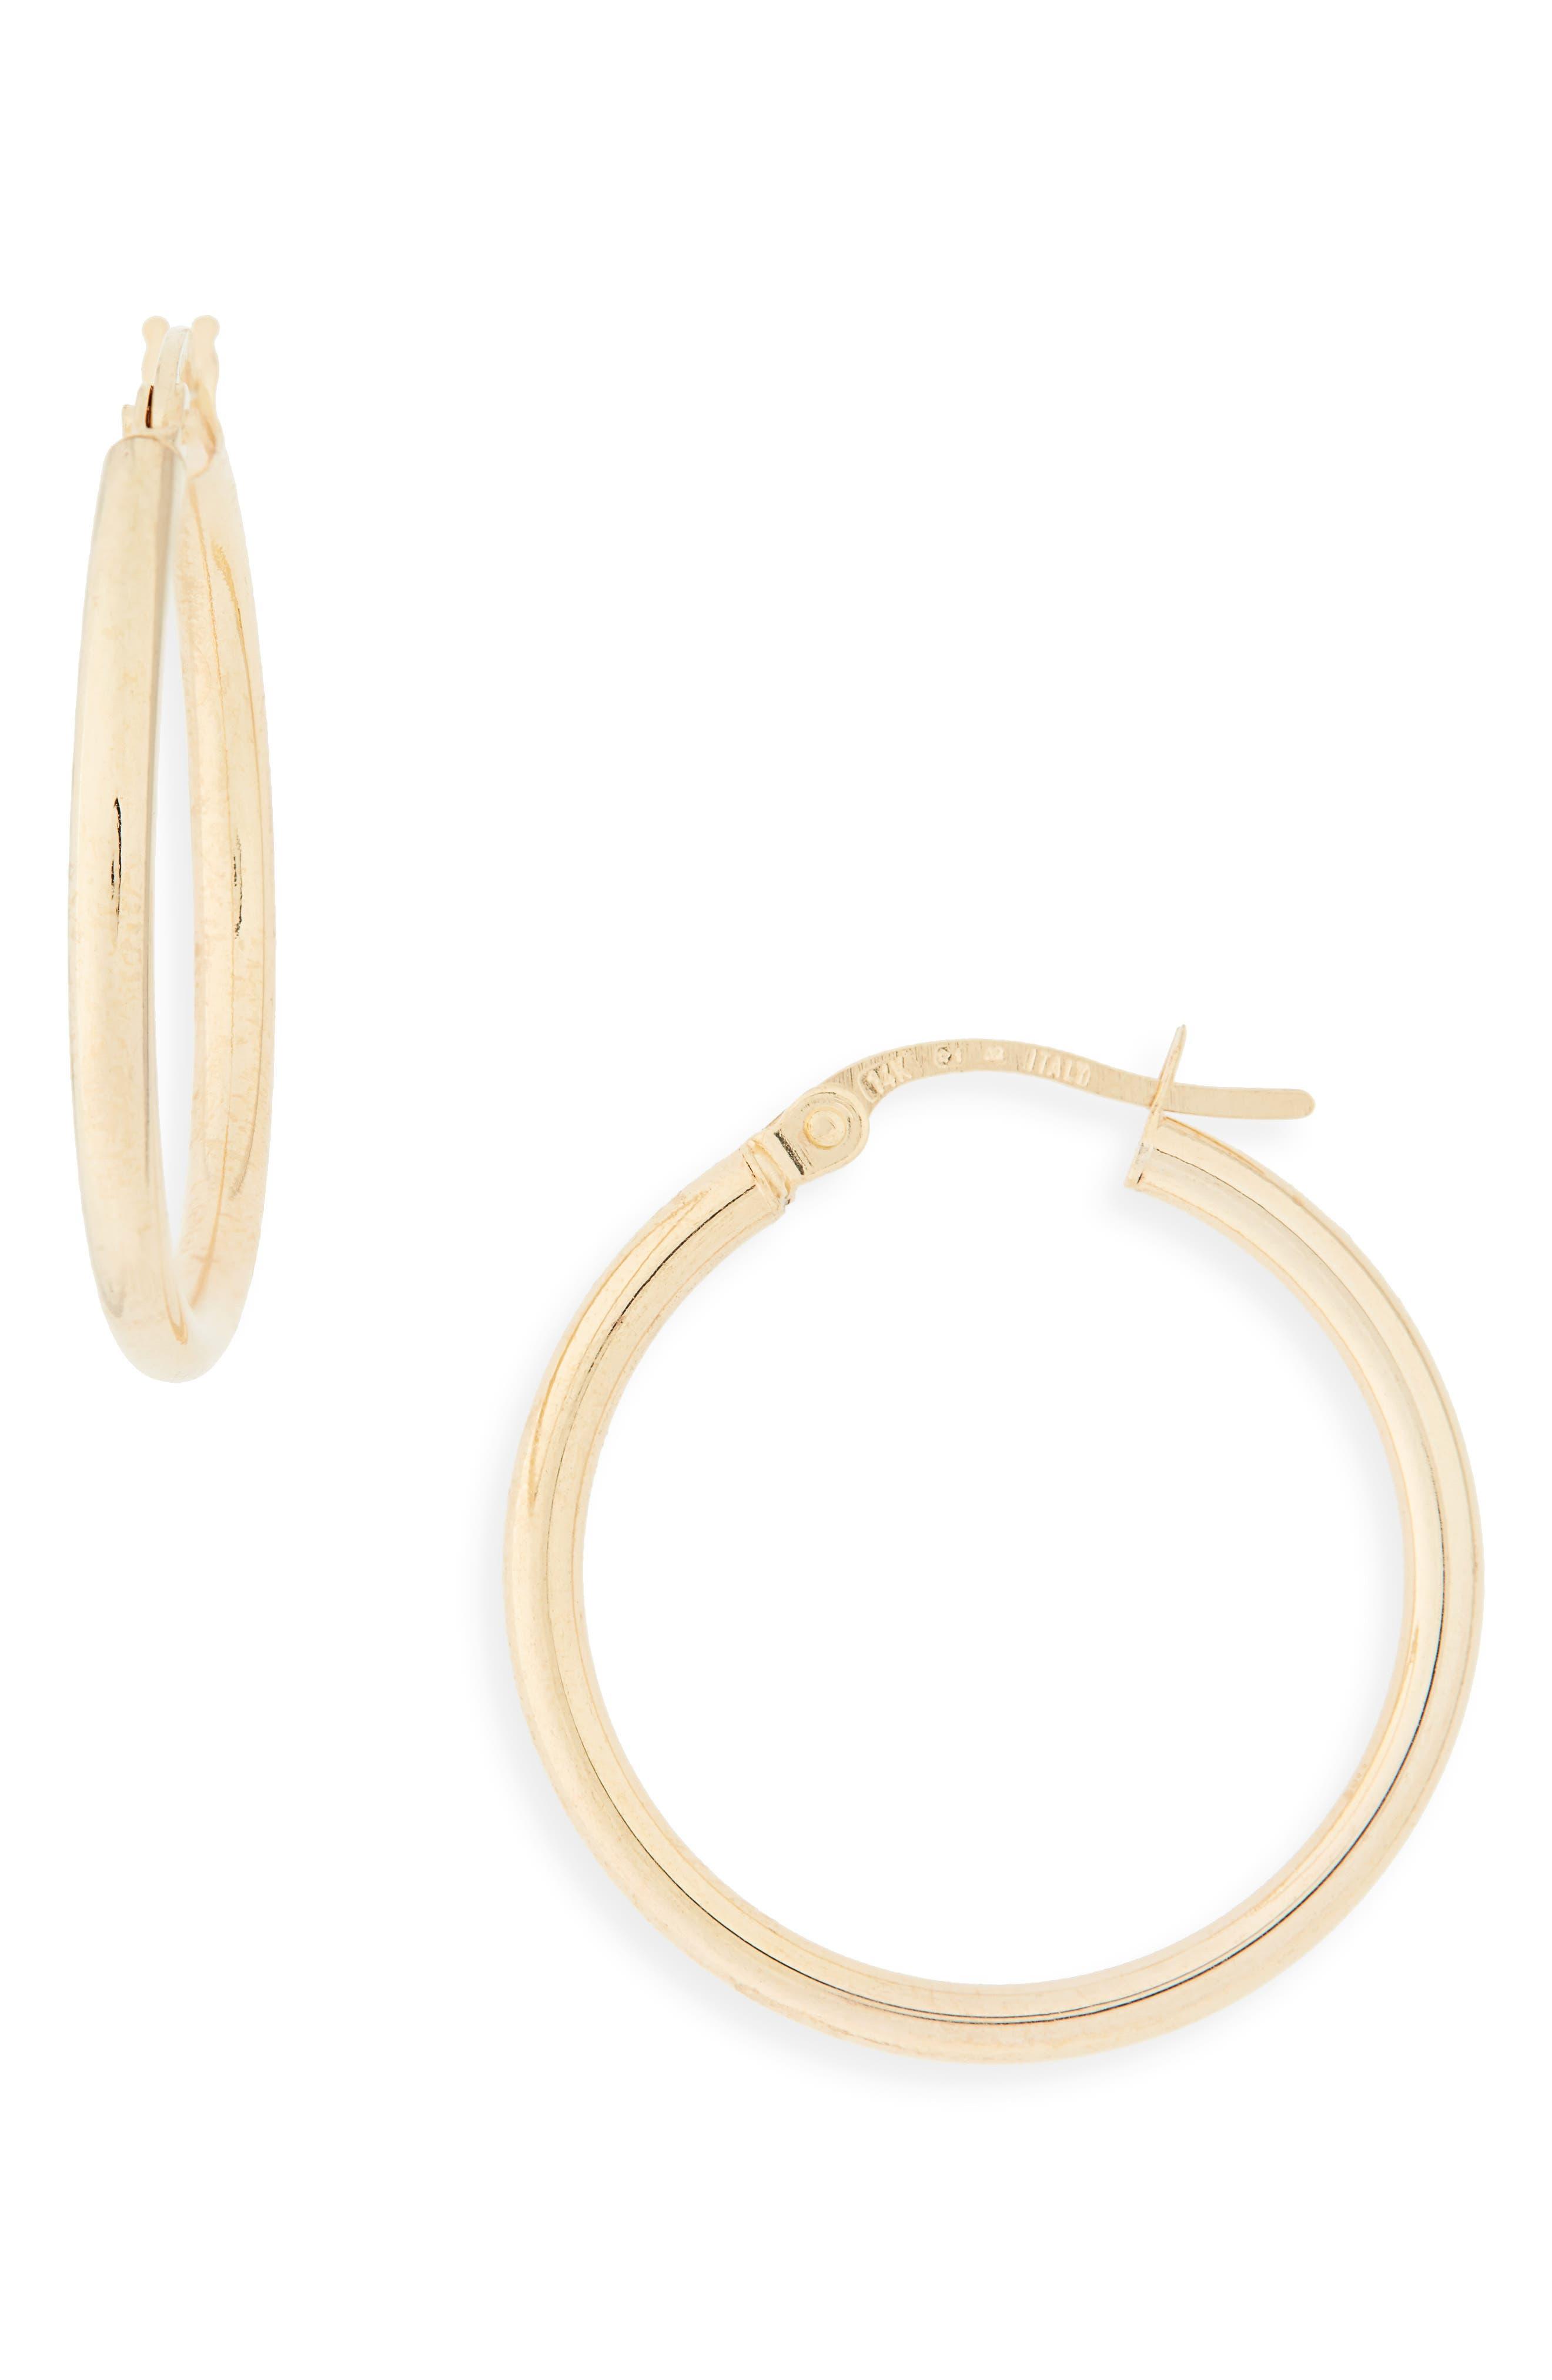 14k Gold Hoop Earrings,                             Alternate thumbnail 2, color,                             YELLOW GOLD